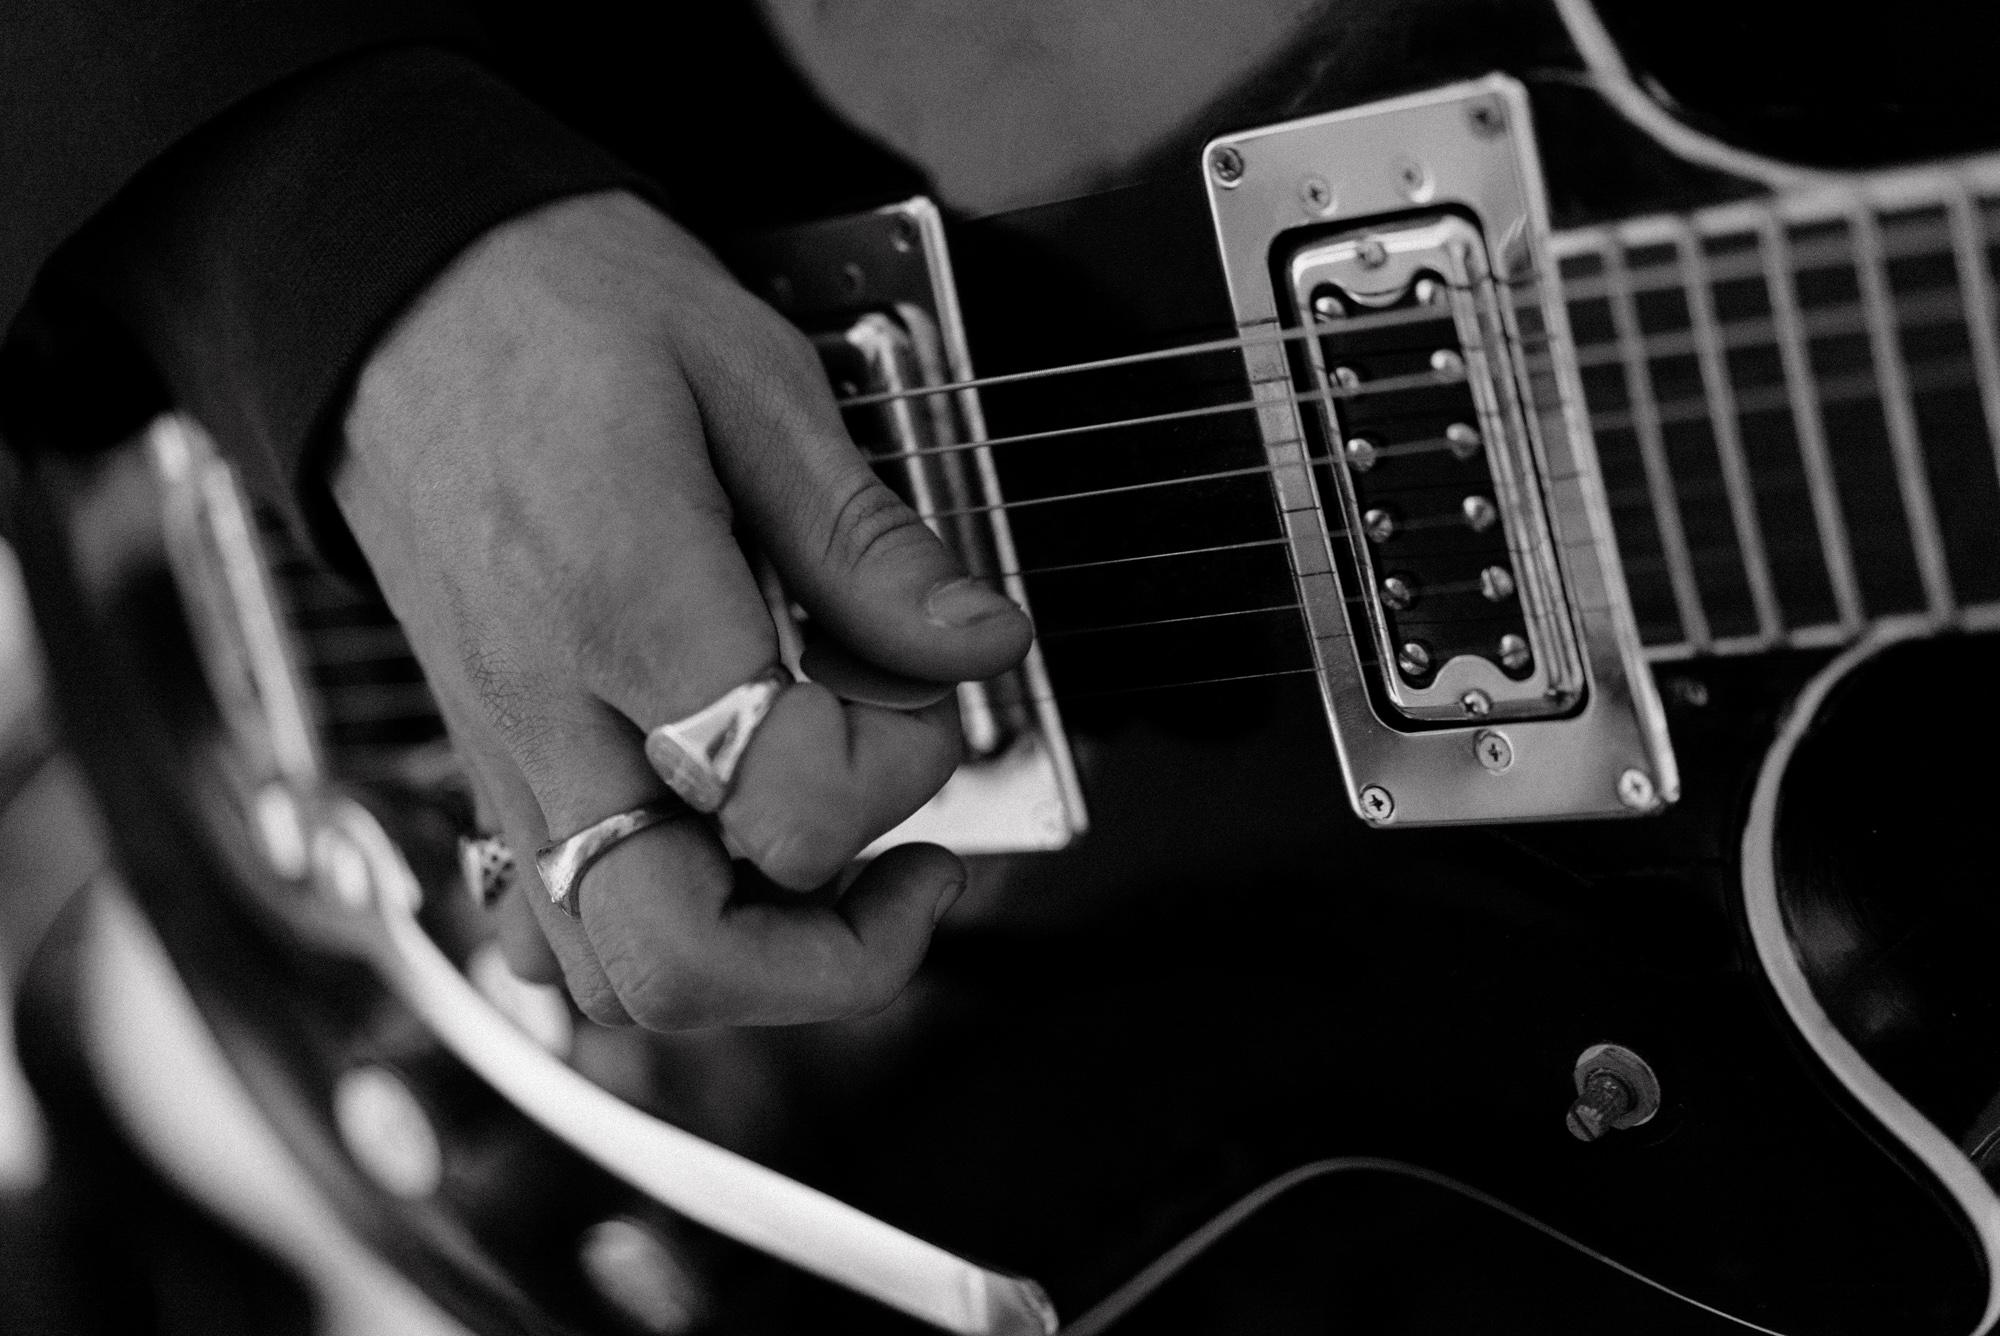 chadpickard_togetherassociates_Harrison_guitar-3.jpg